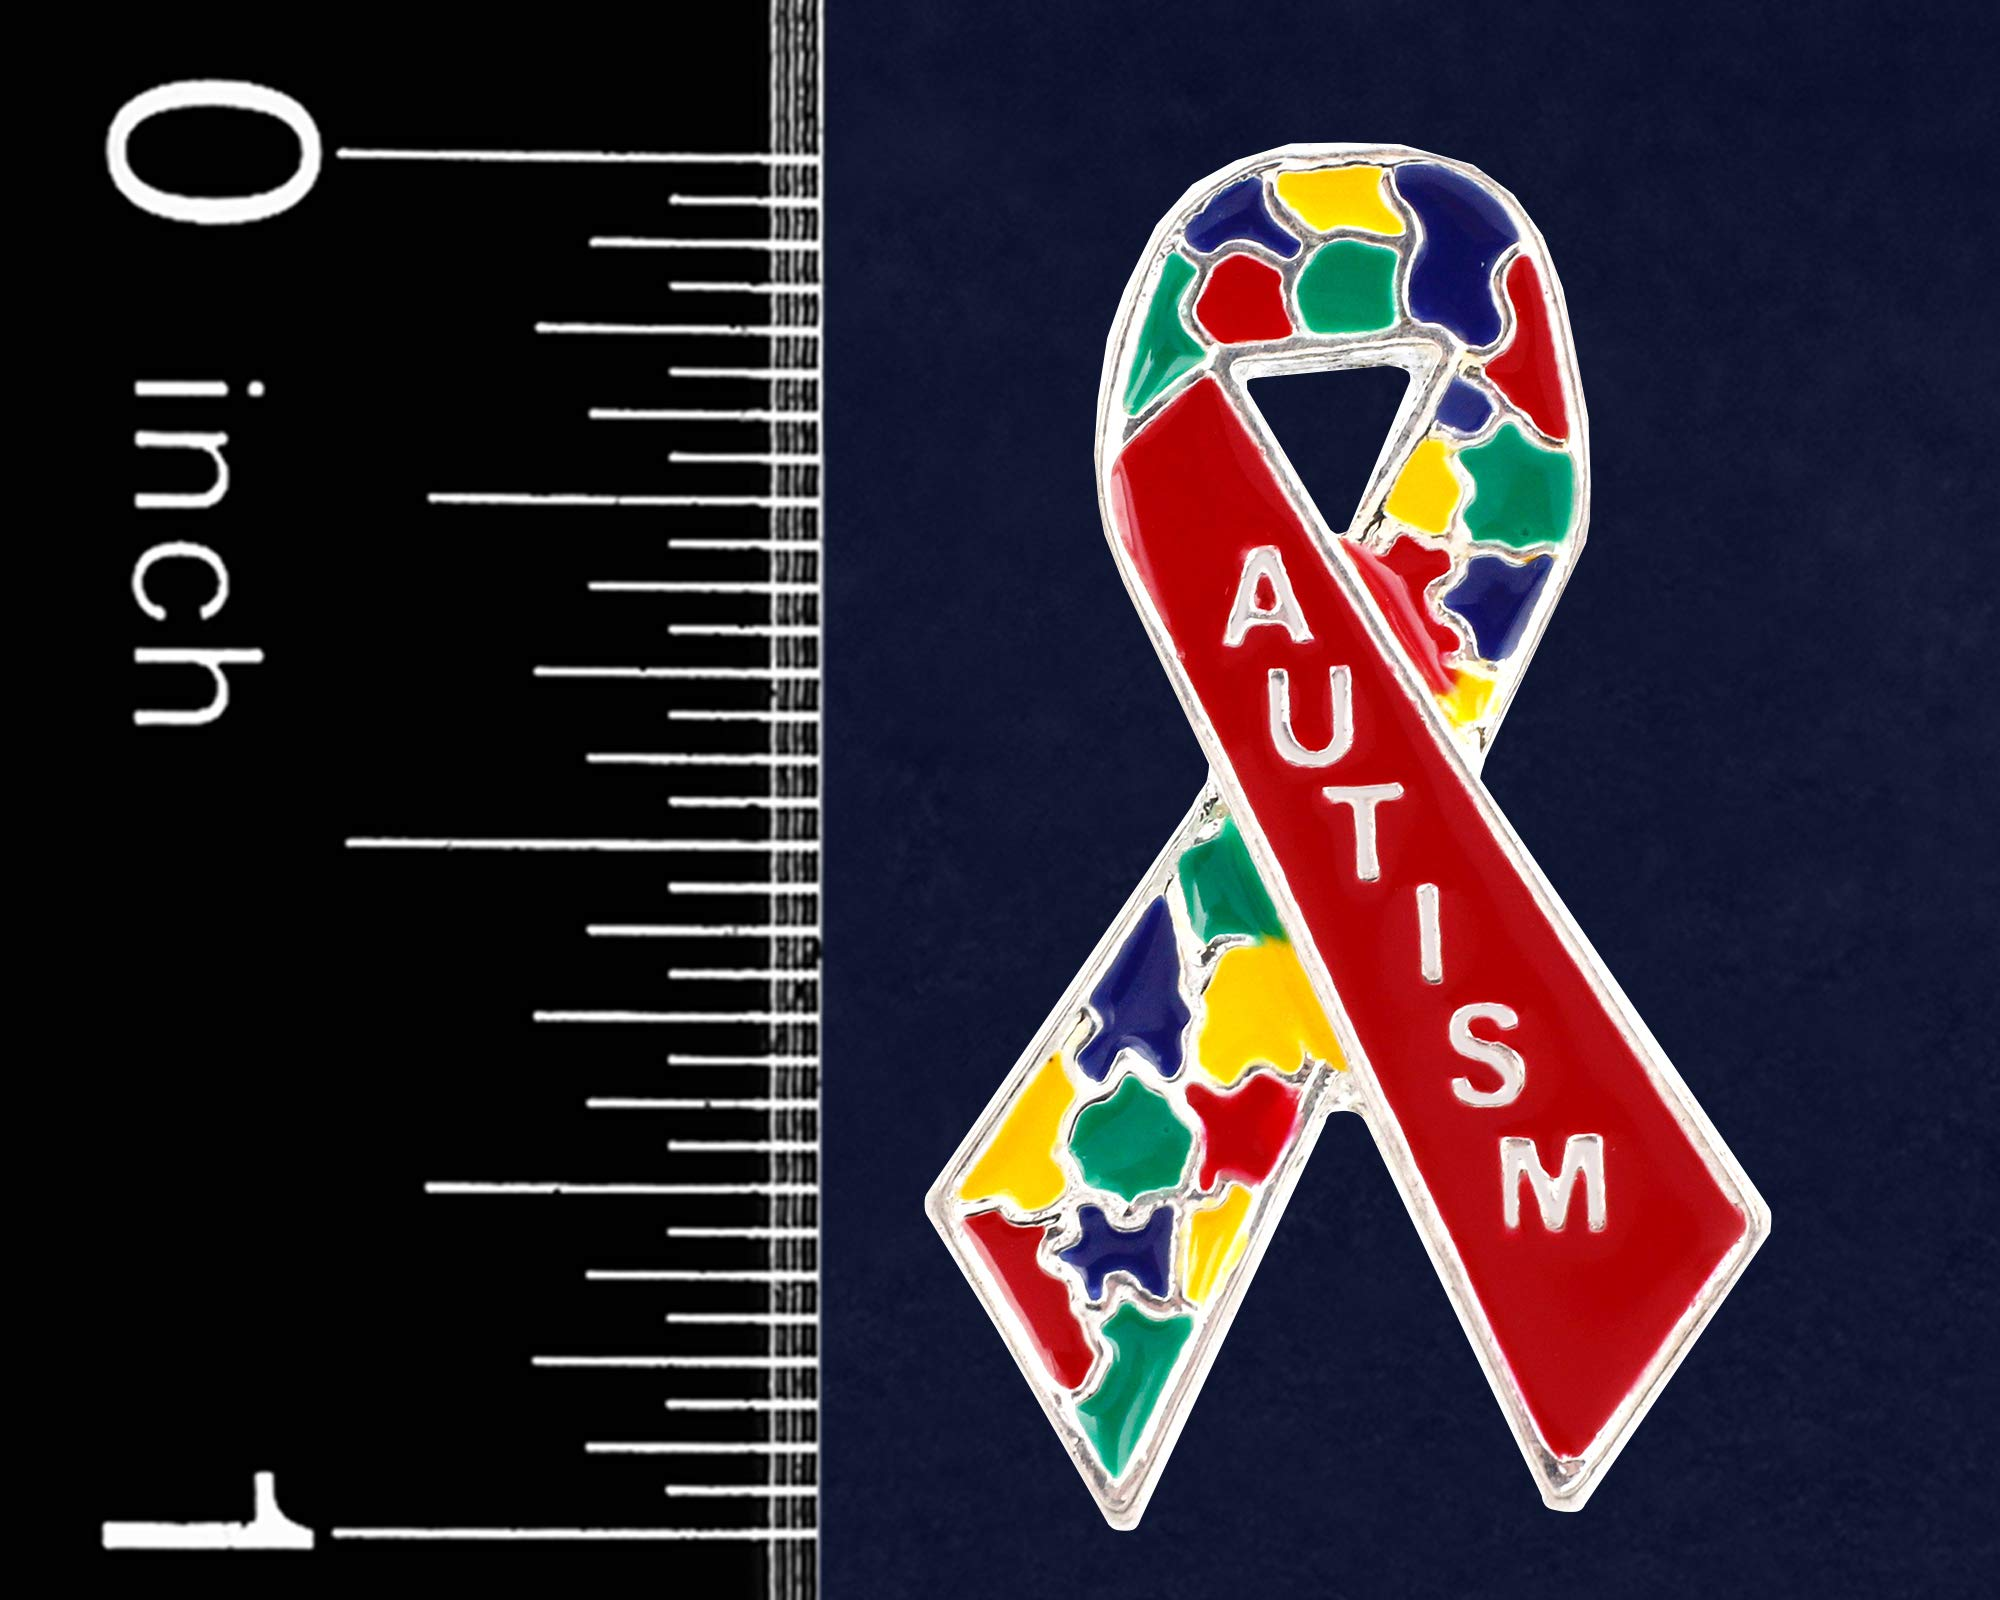 25 Pack Autism Awareness Multicolored Puzzle Piece Pins (25 Pins, Autism Awareness Ribbon Pin)